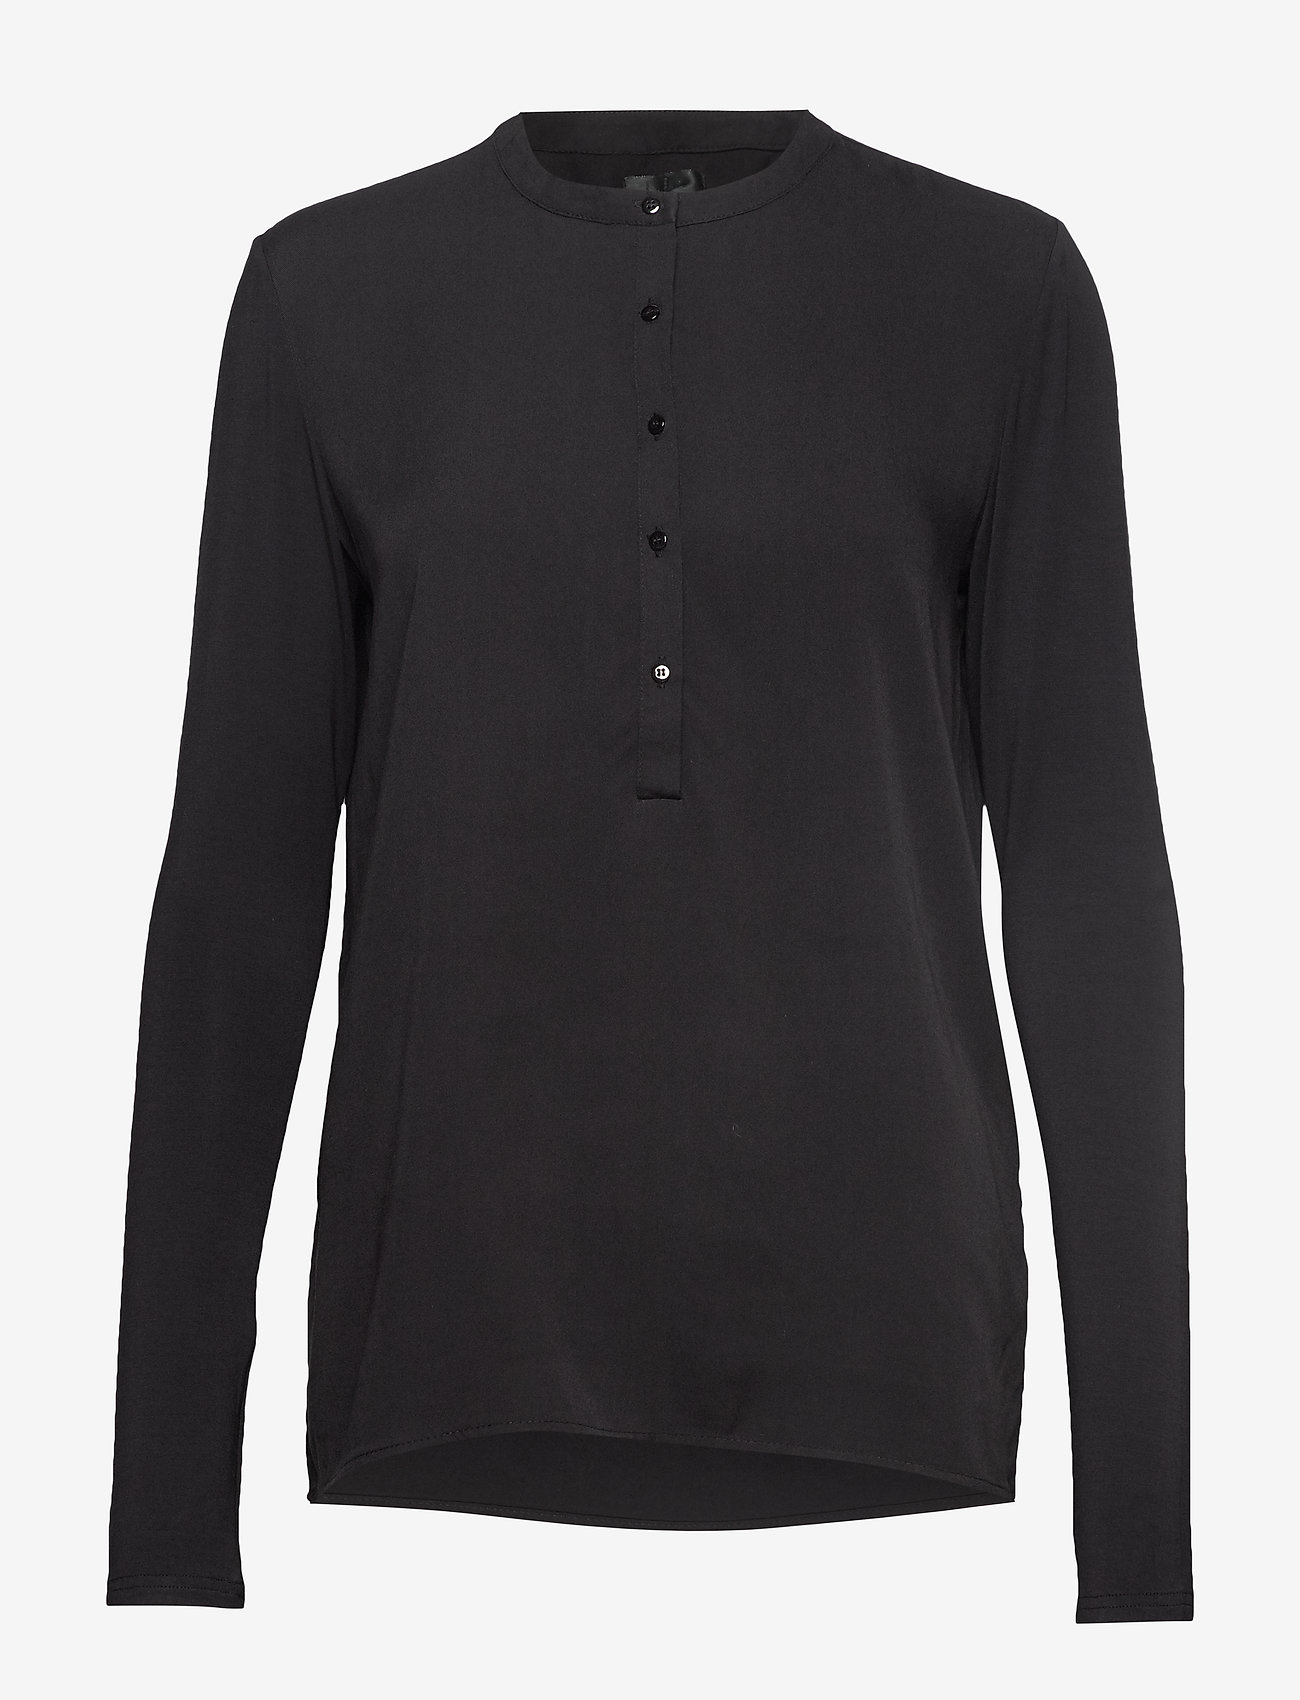 Lulu's Drawer - Houston blouse - pitkähihaiset puserot - black